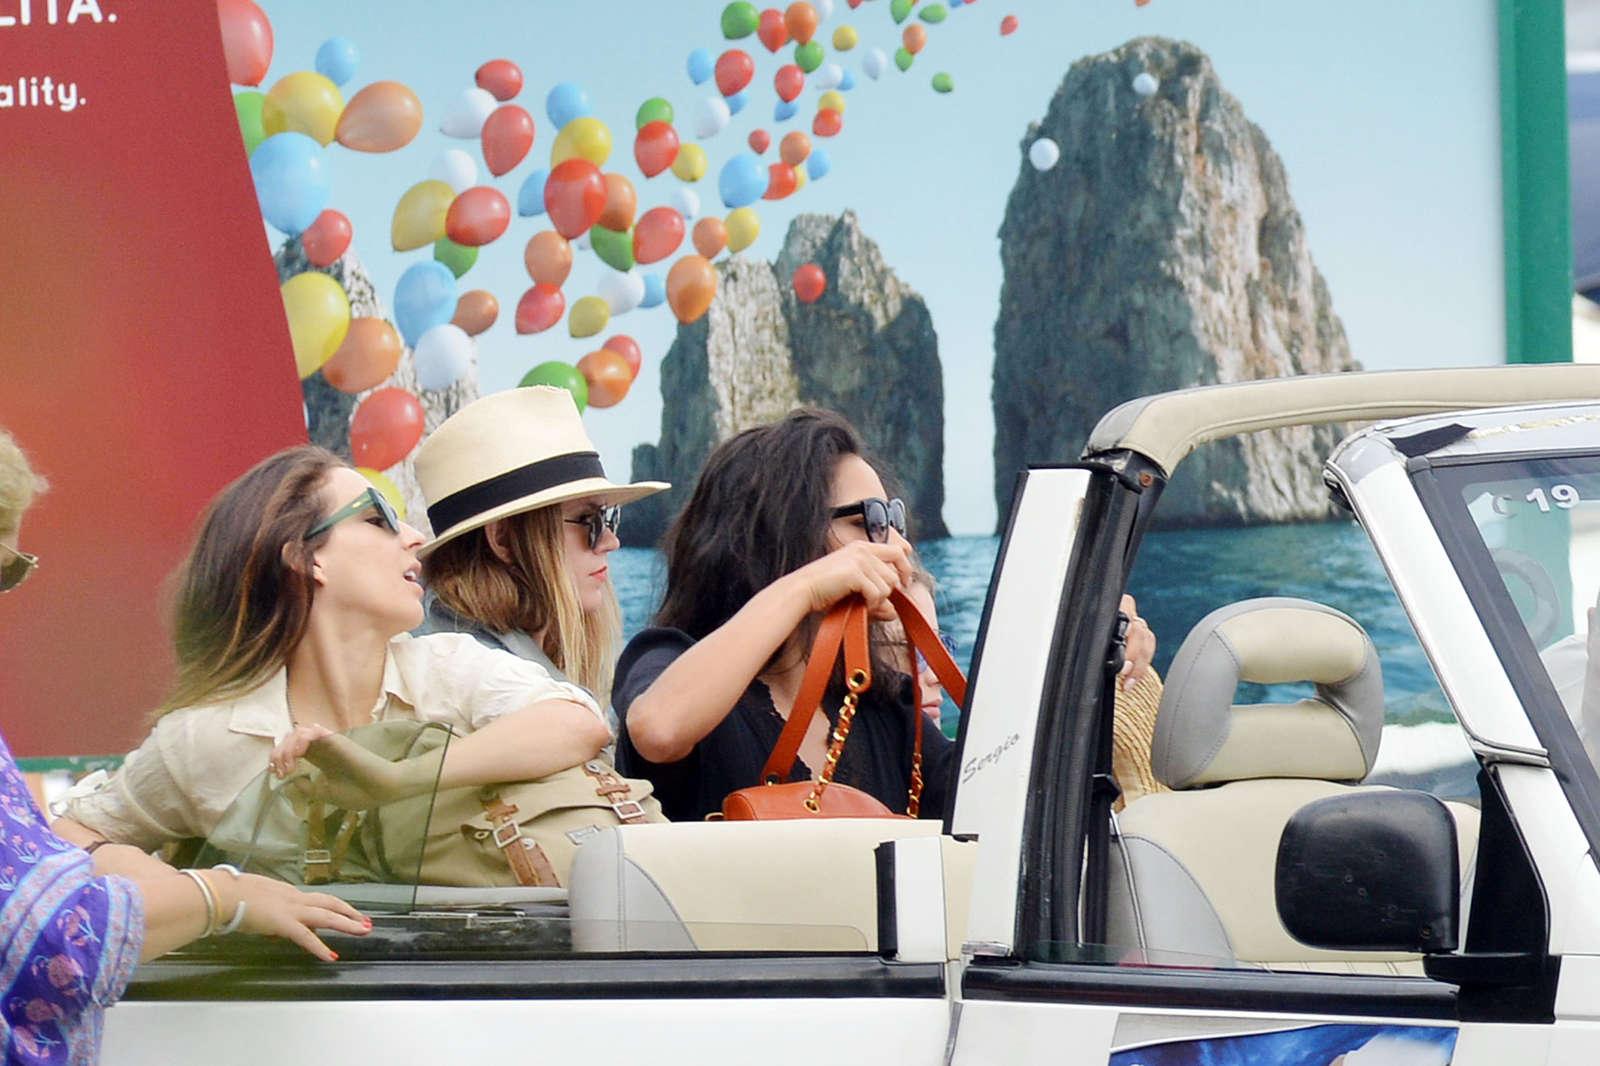 Ashley Benson 2016 : Ashley Benson, Shay Mitchell and Troian Bellisario on a boat in Capri -17